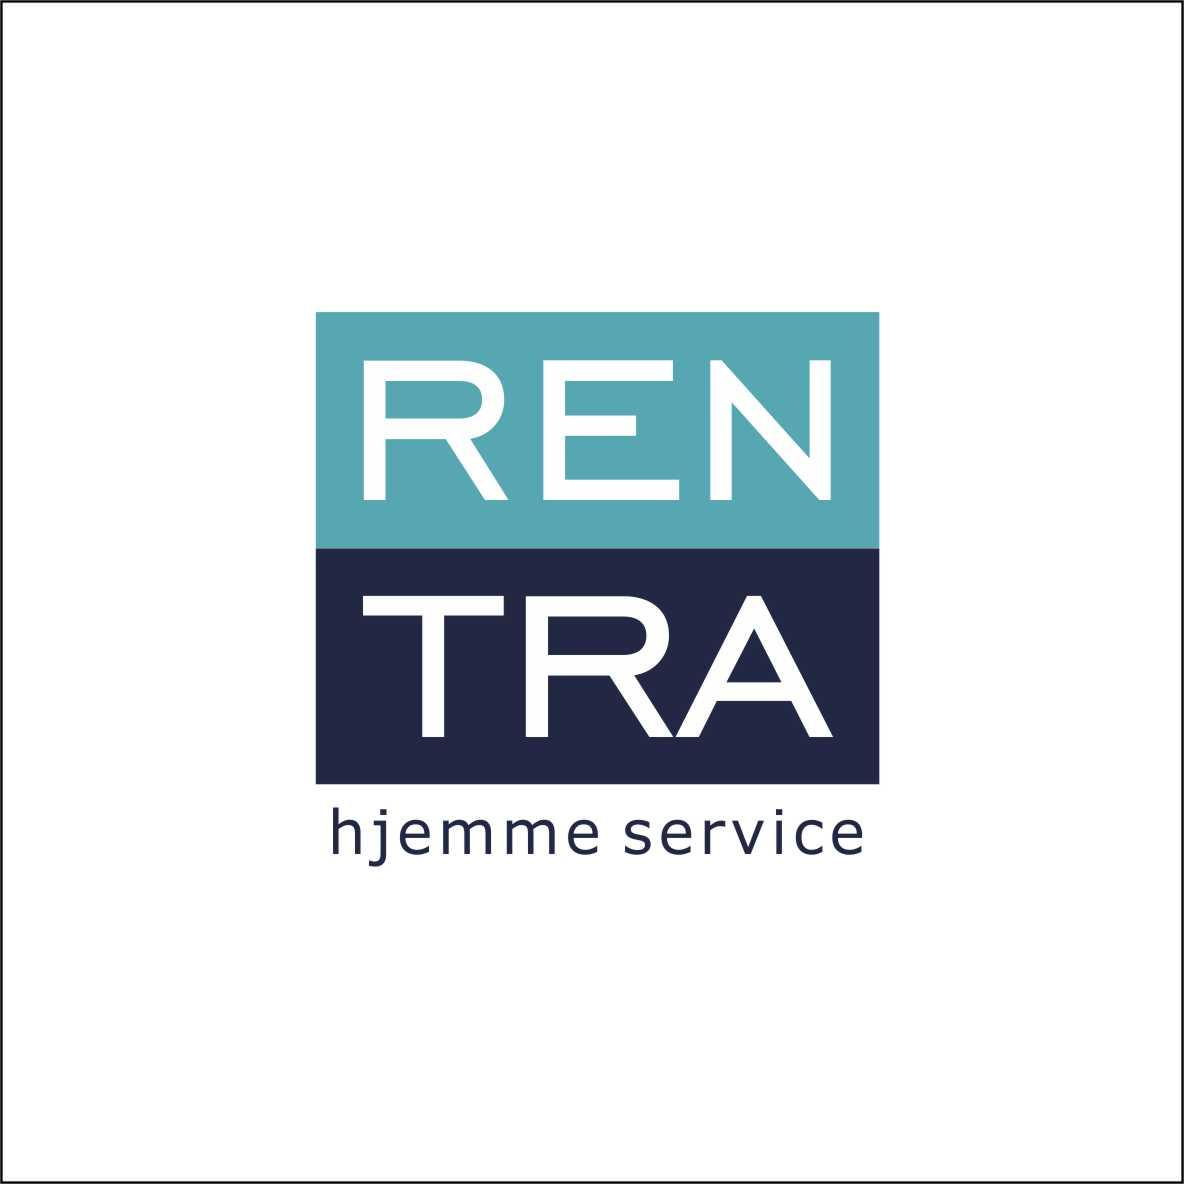 Logo_Rentra1